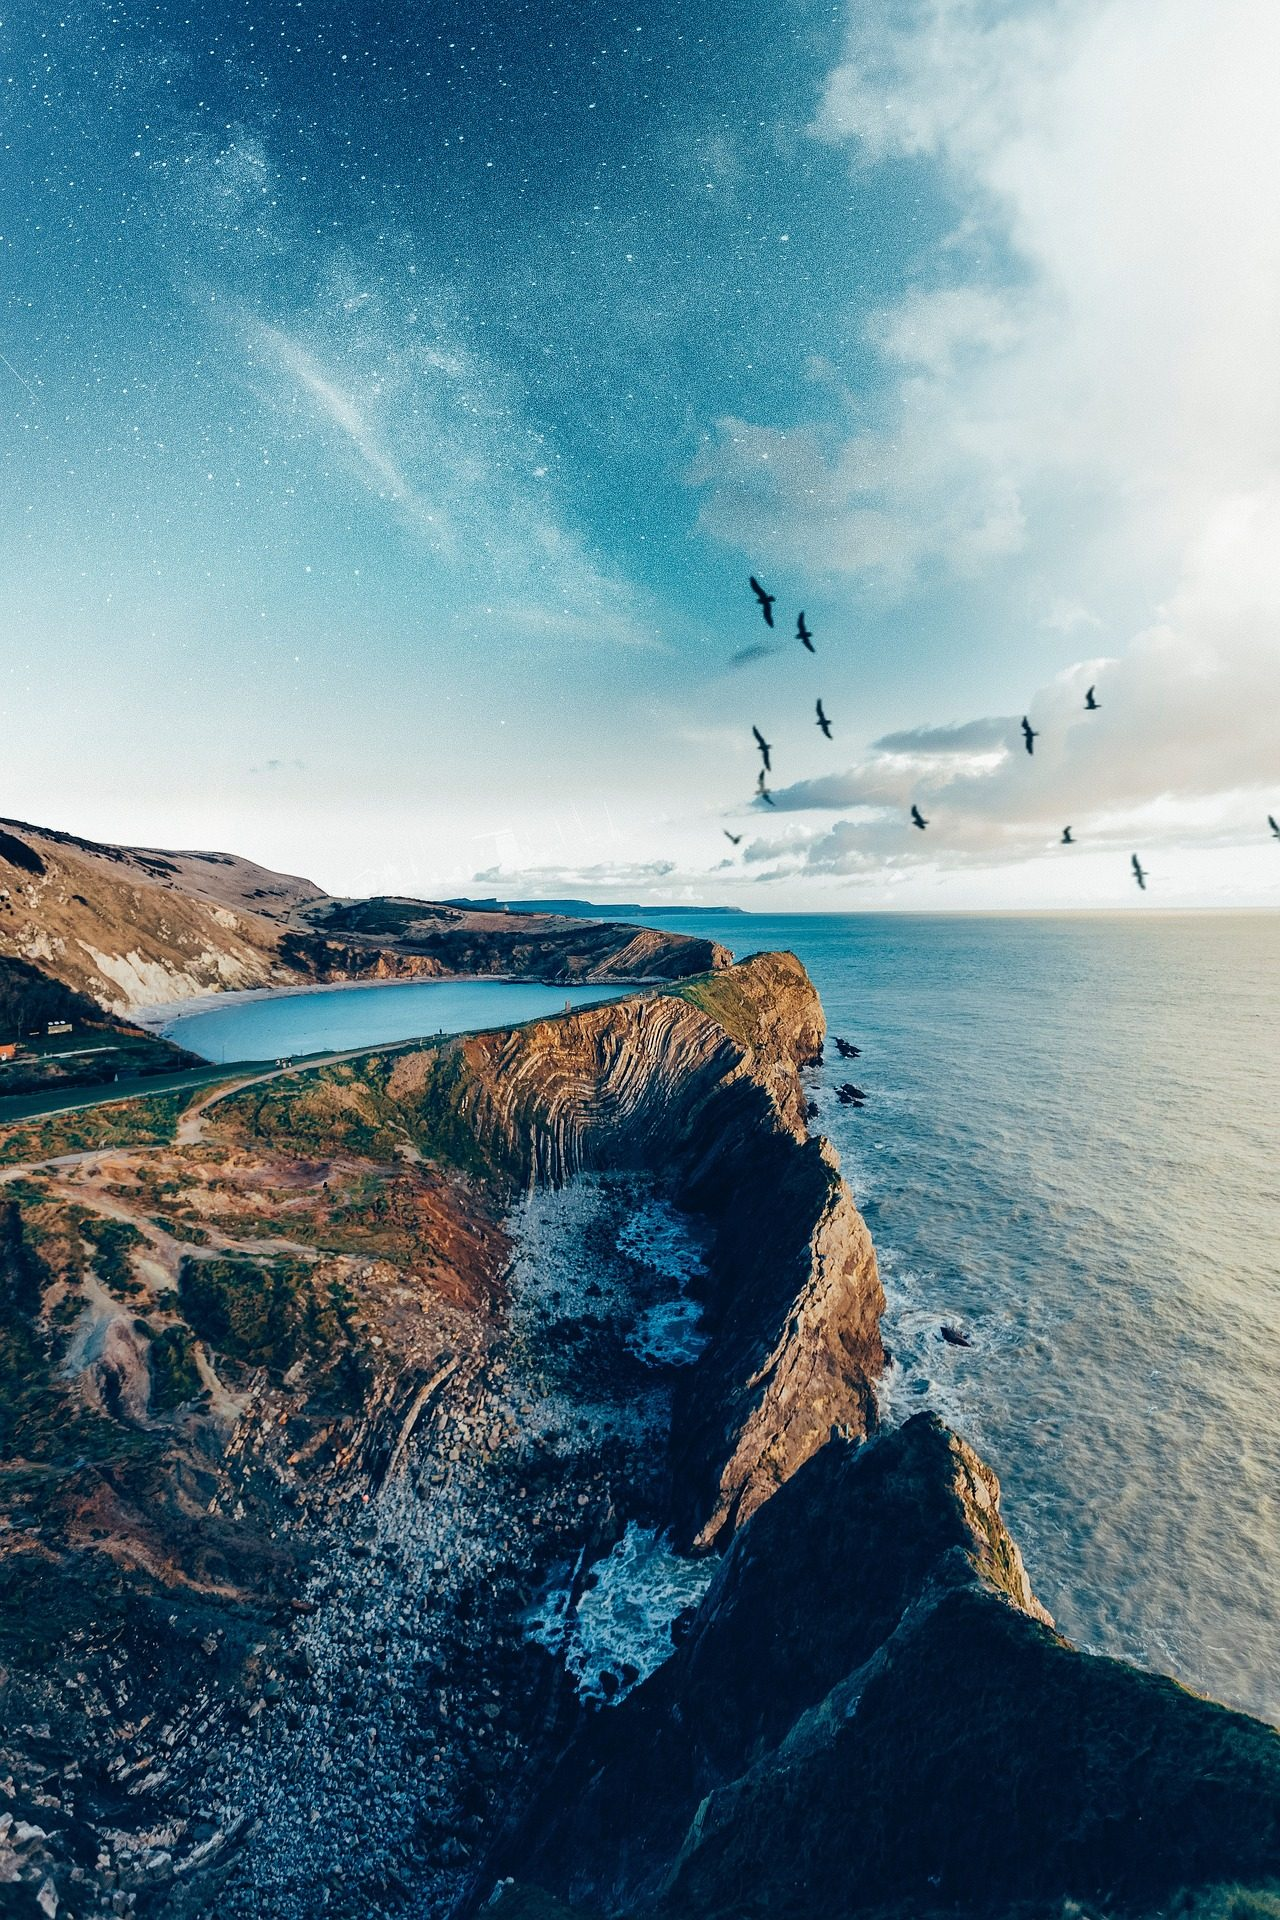 Cliff, Strada, Mare, Ocean, Laguna, uccelli, Cielo, nuvole - Sfondi HD - Professor-falken.com